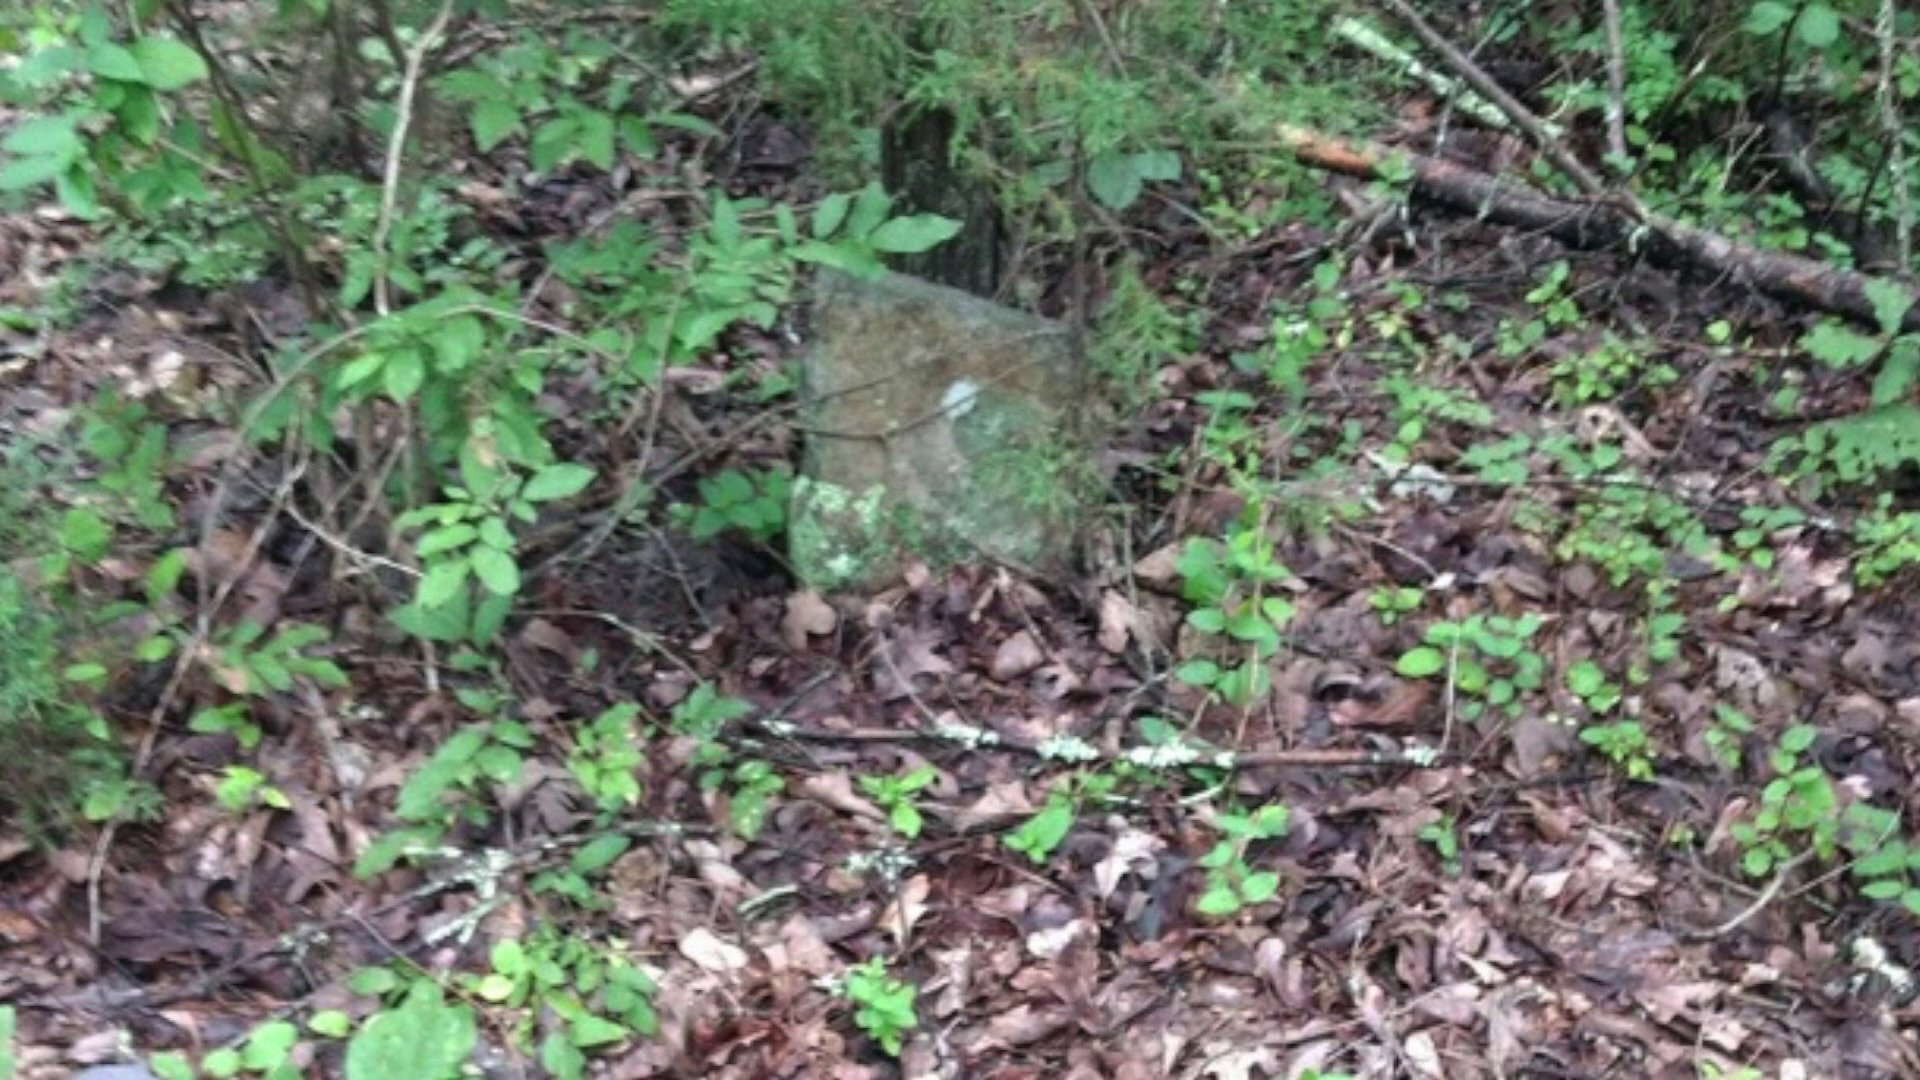 Photos: Burial site, historic school could impact Green Ridge Landfillplans